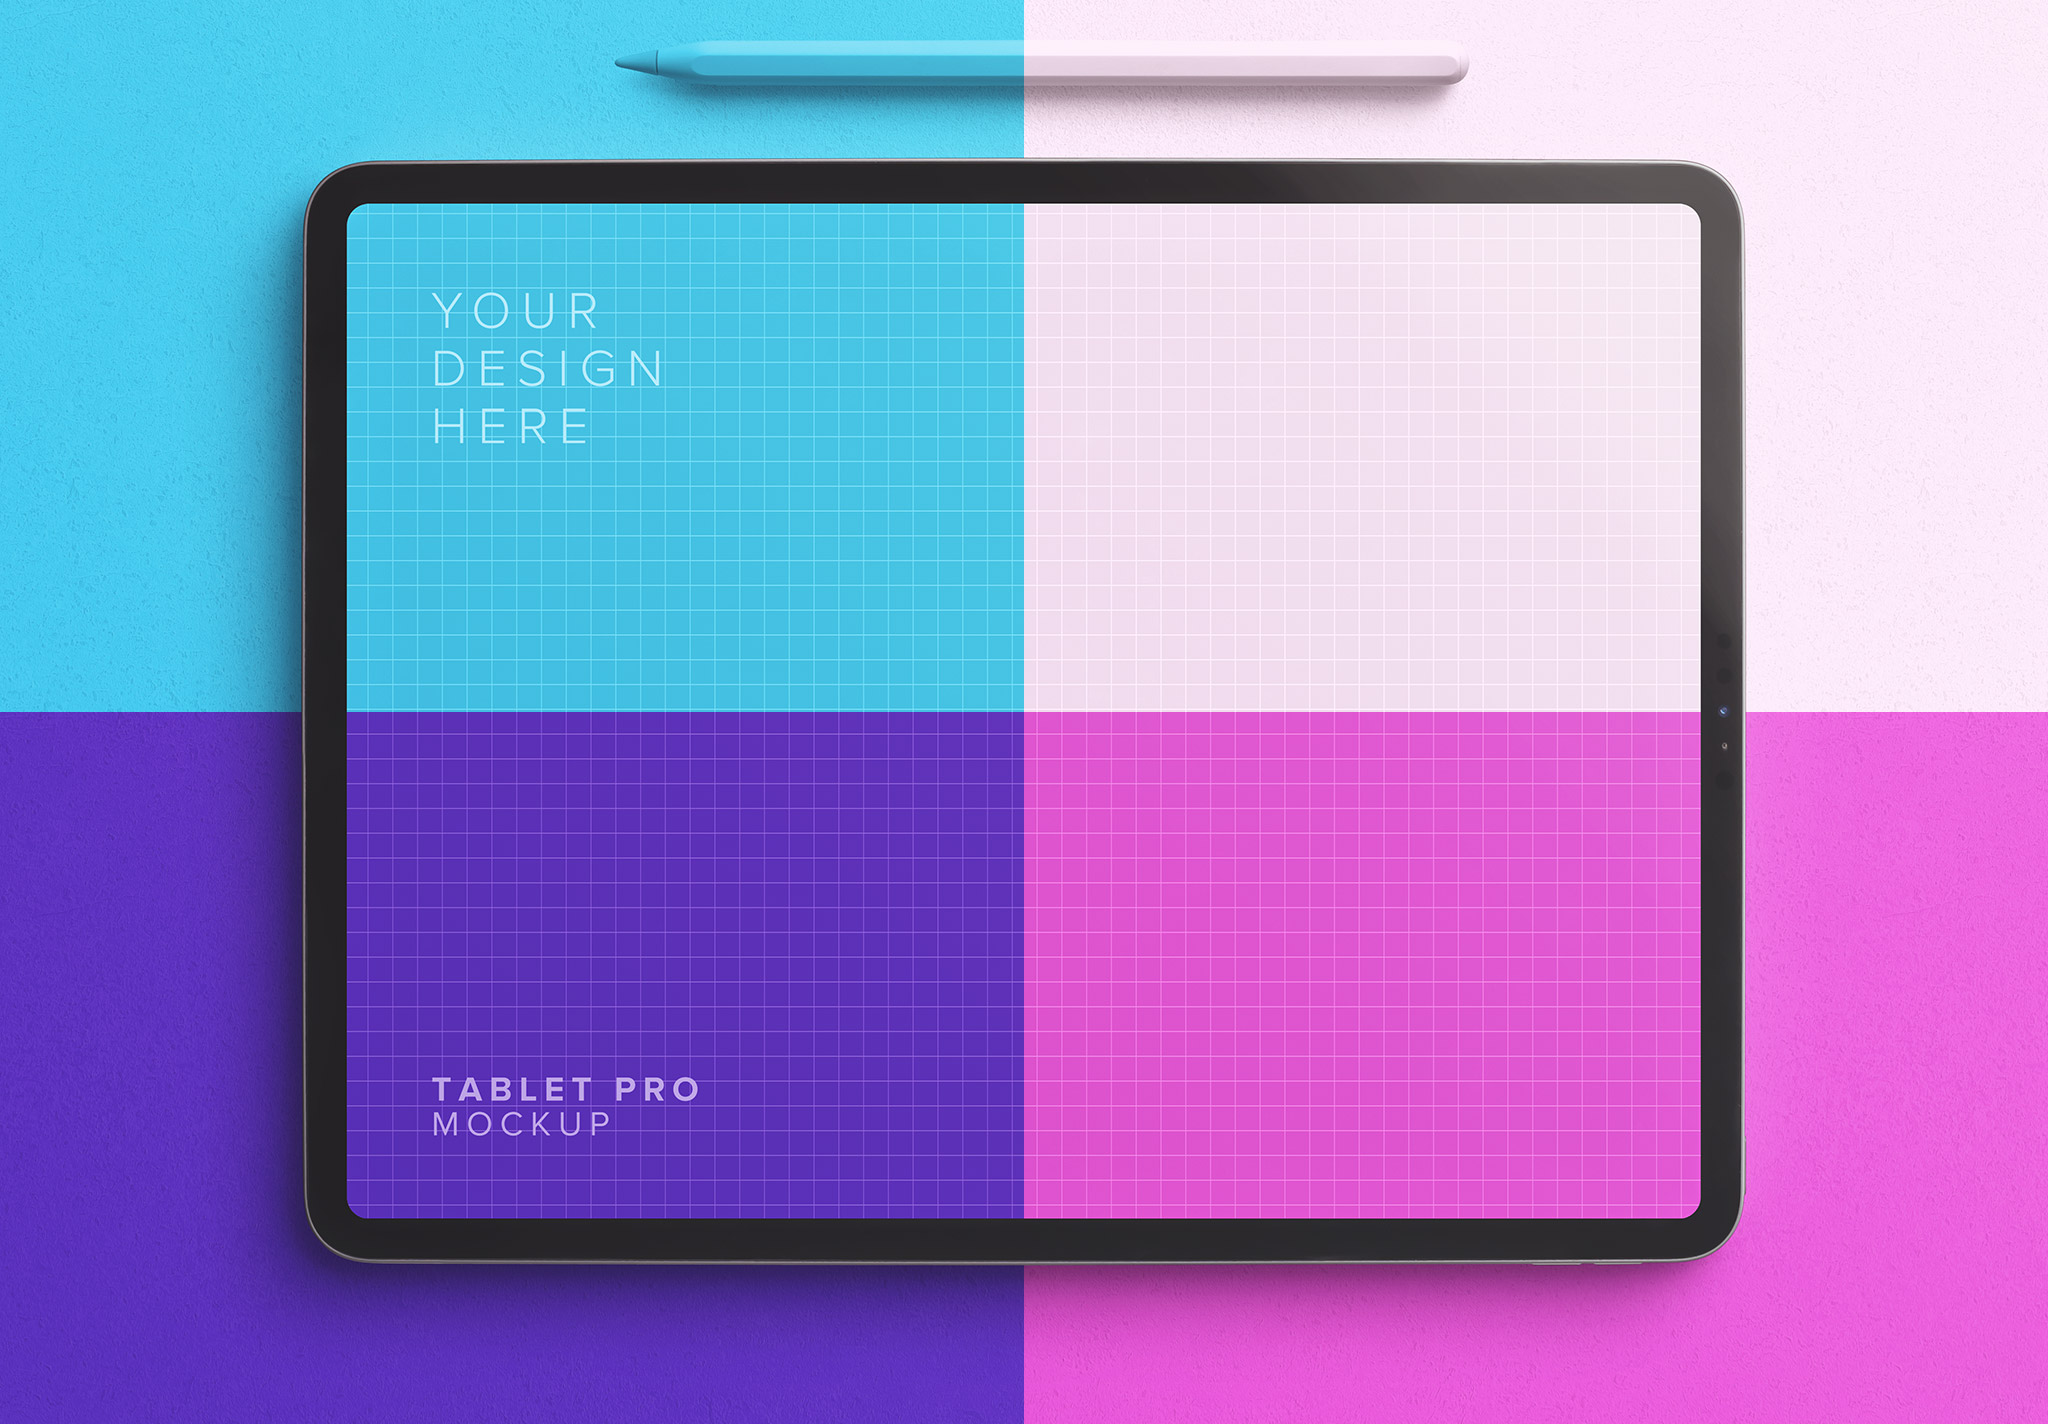 iPad Pro 12.9inch Mockup - Image 2